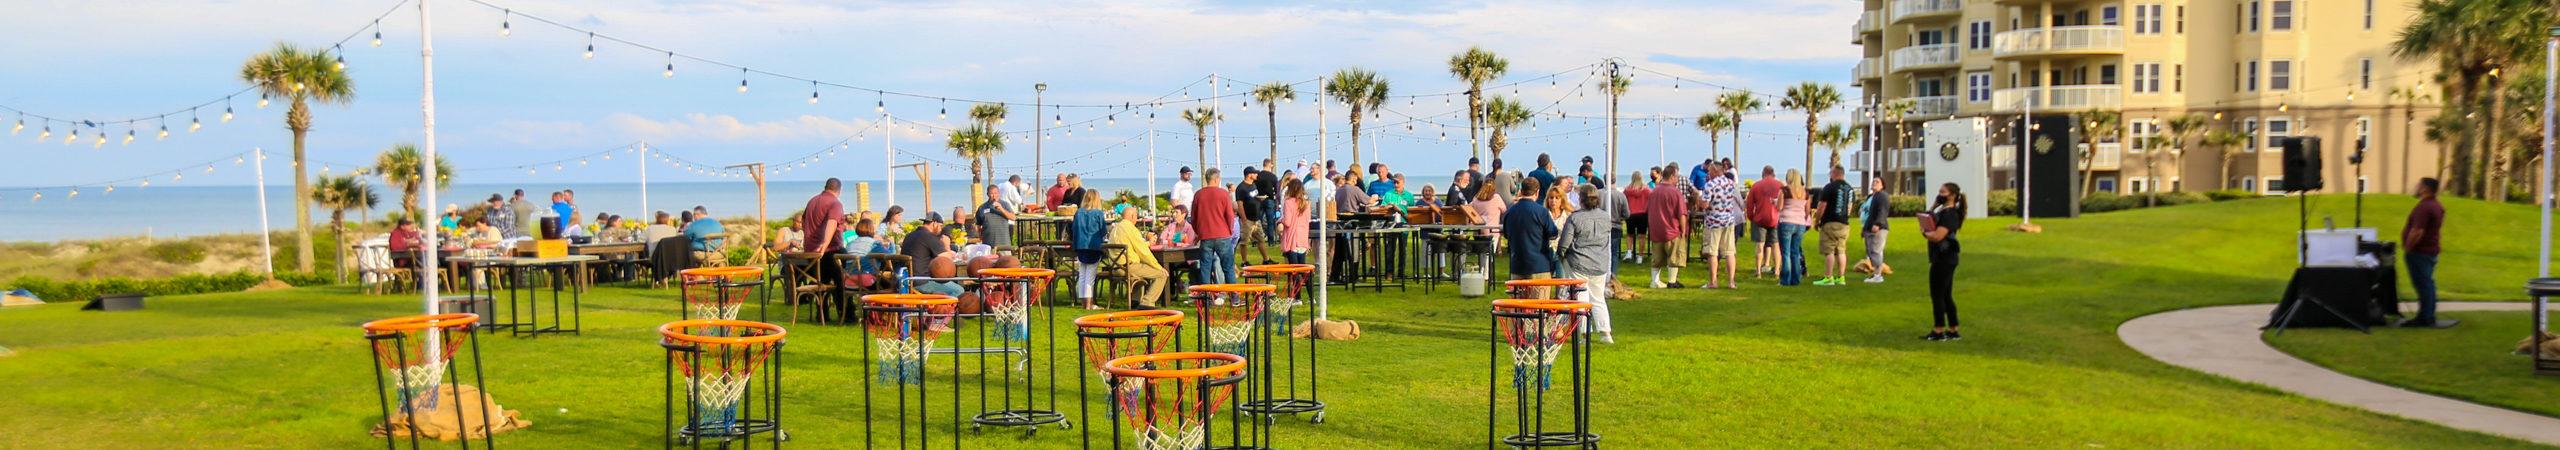 Block Party at the Ritz-Carlton, Amelia Island